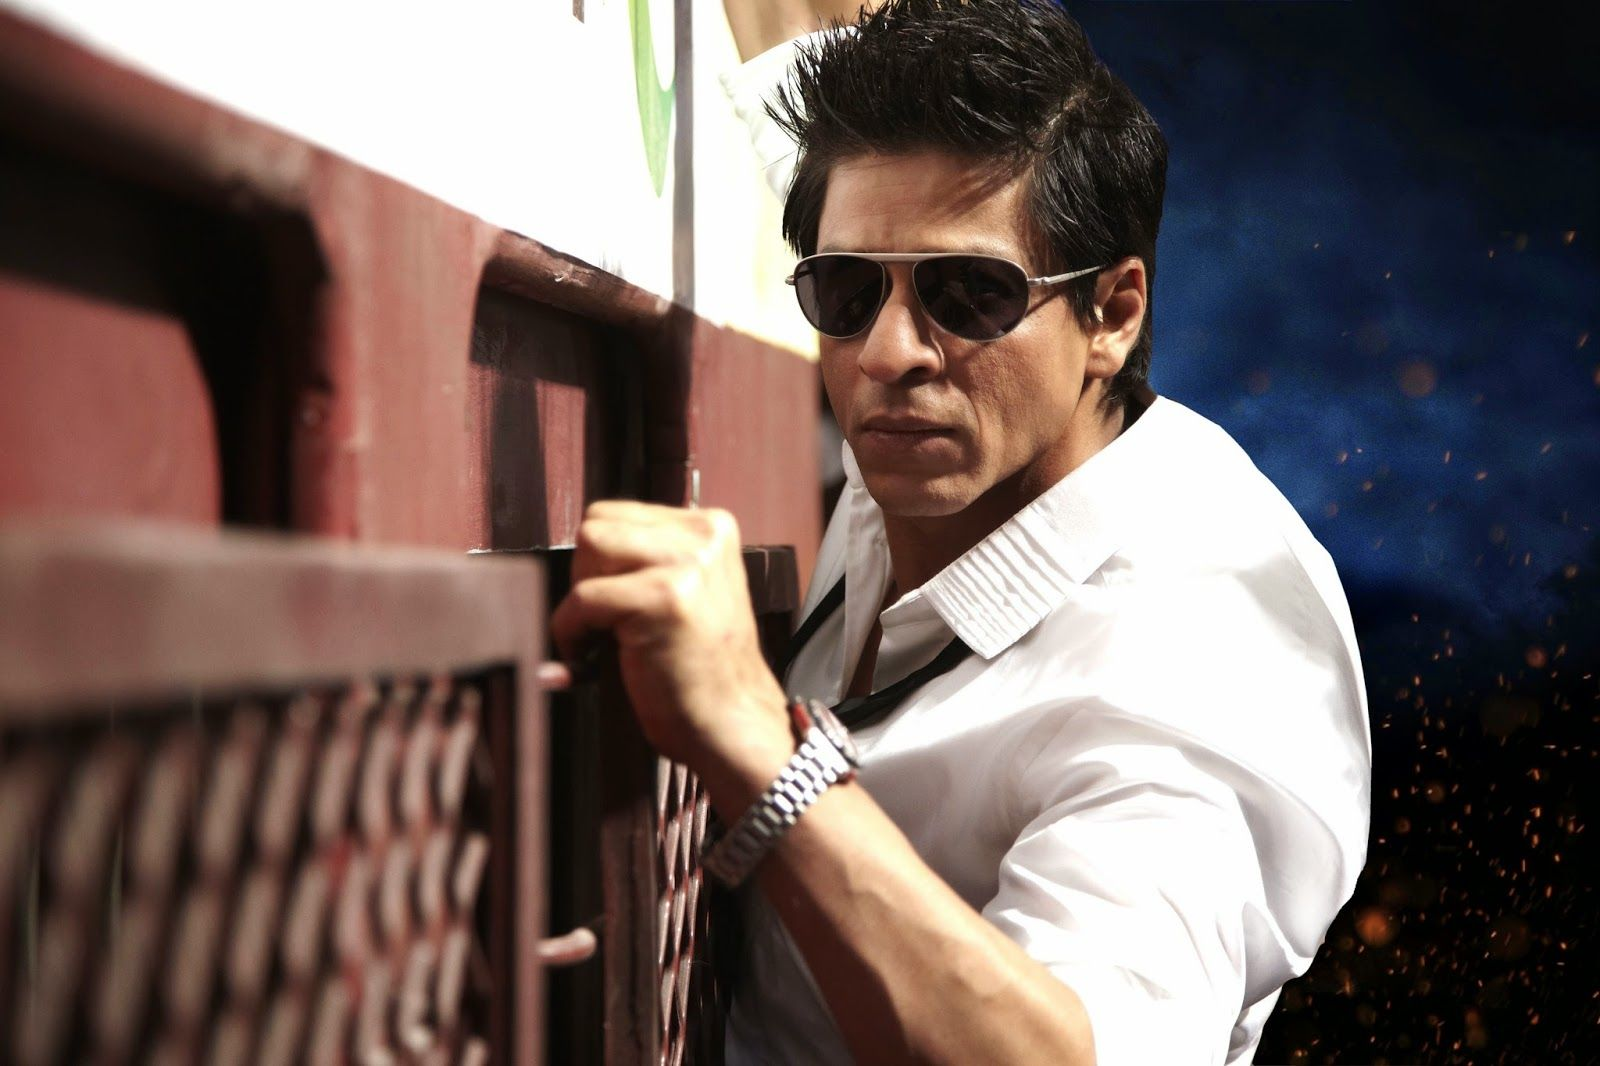 Fine Super HD Wallpapers: Shahrukh Khan BOLLYWOOD ACTORS, dashing, desktop wallpaper, download, free, handsome, hd, hd wallpaper, khan, king khan, ra one, ...